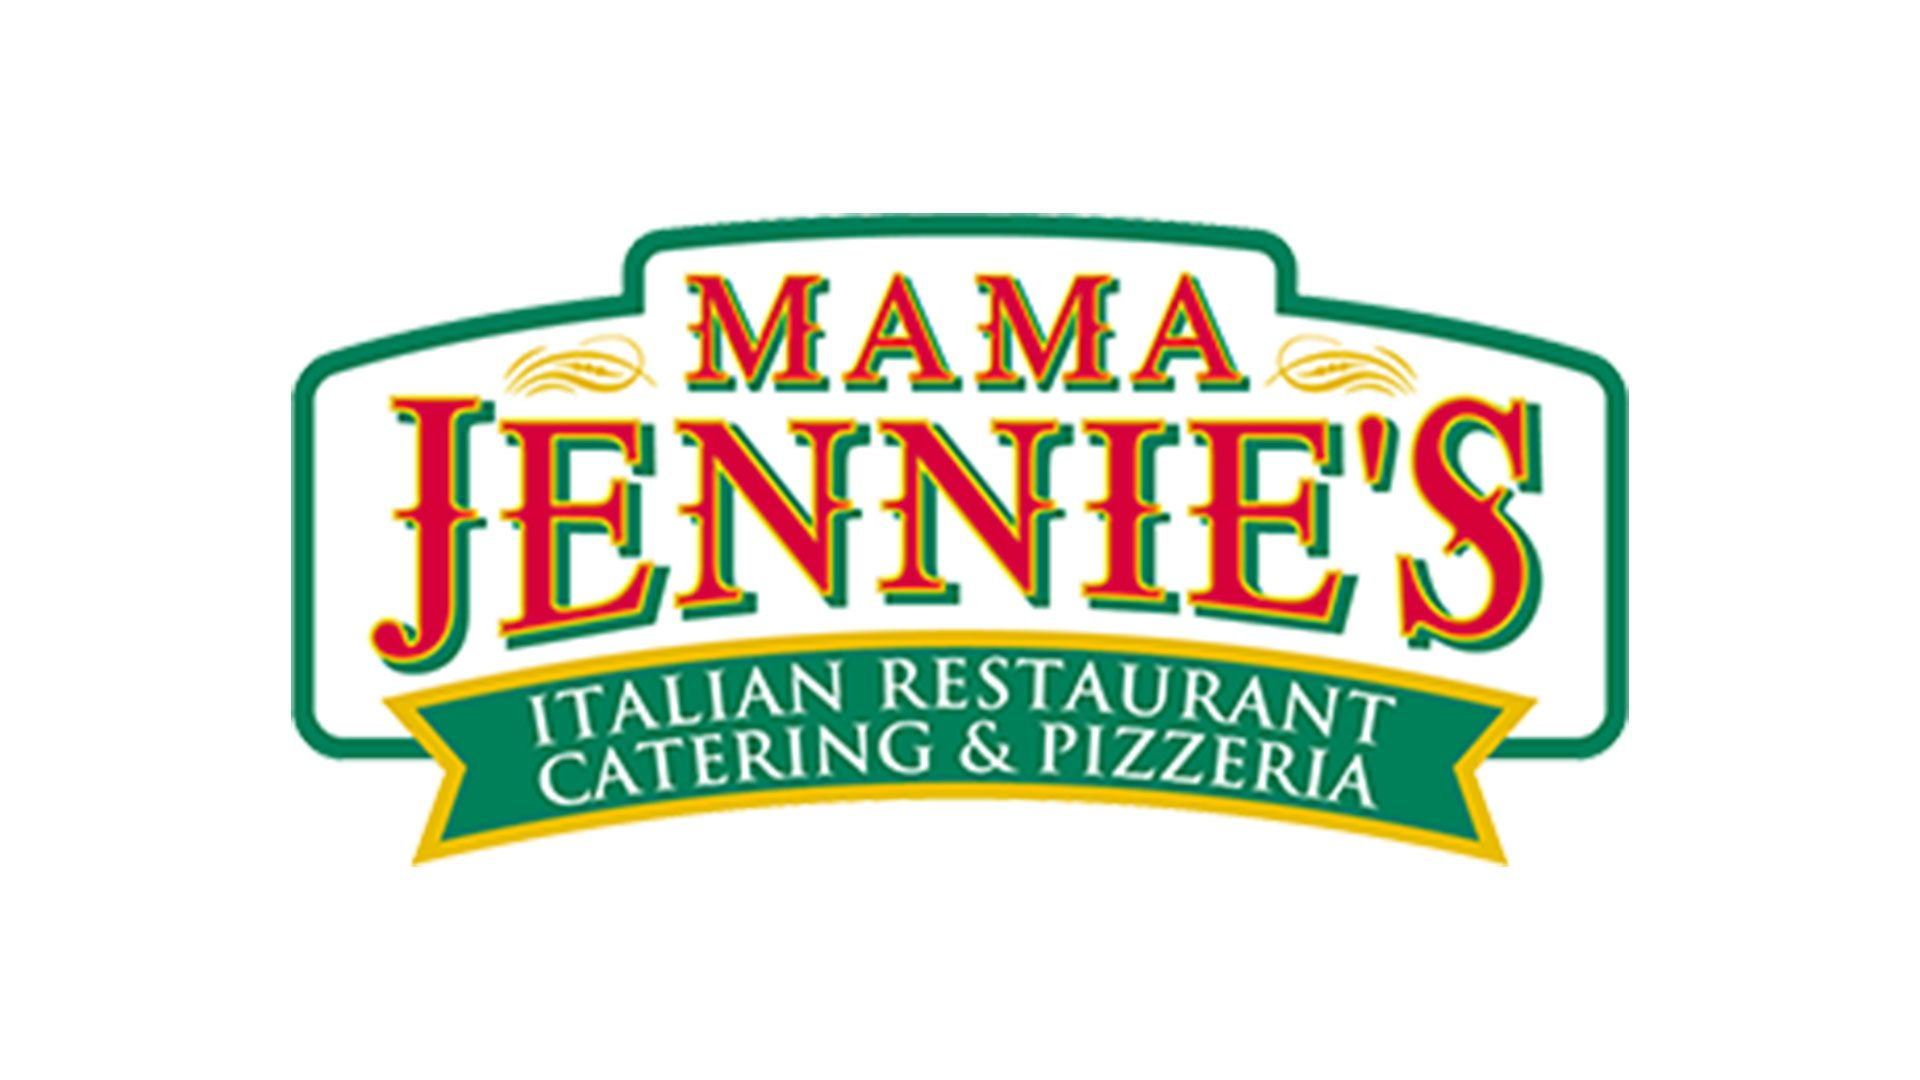 Mama Jennie's Italian Restaurant